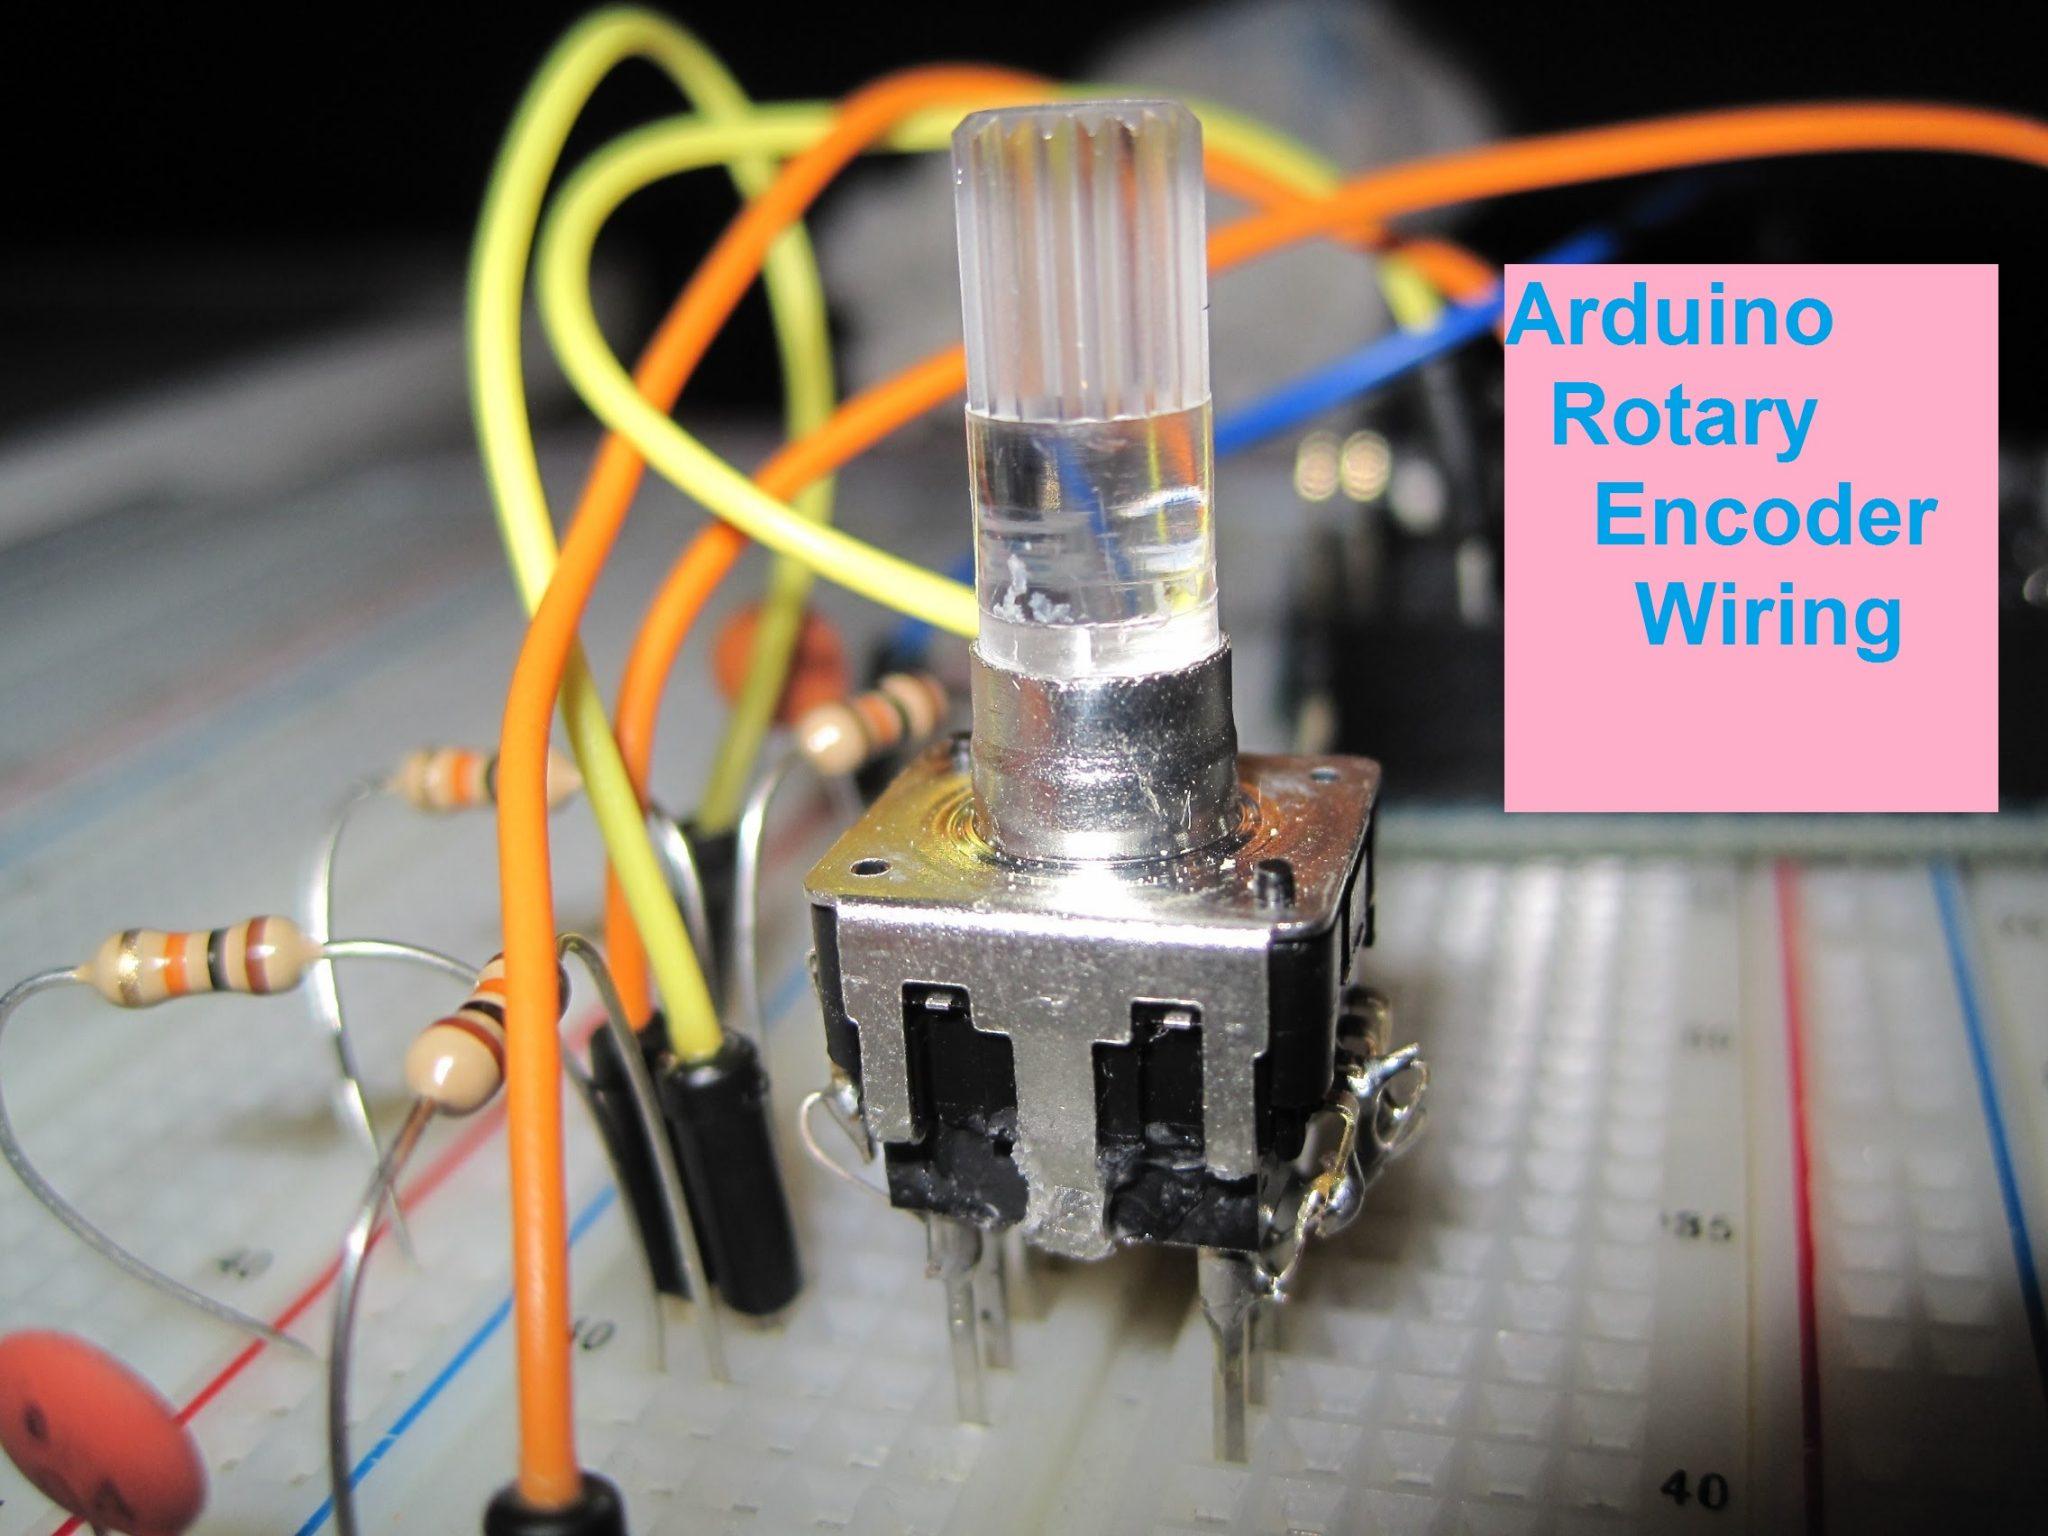 Arduino-Rotary-Encoder-Wiring-featured.jpg